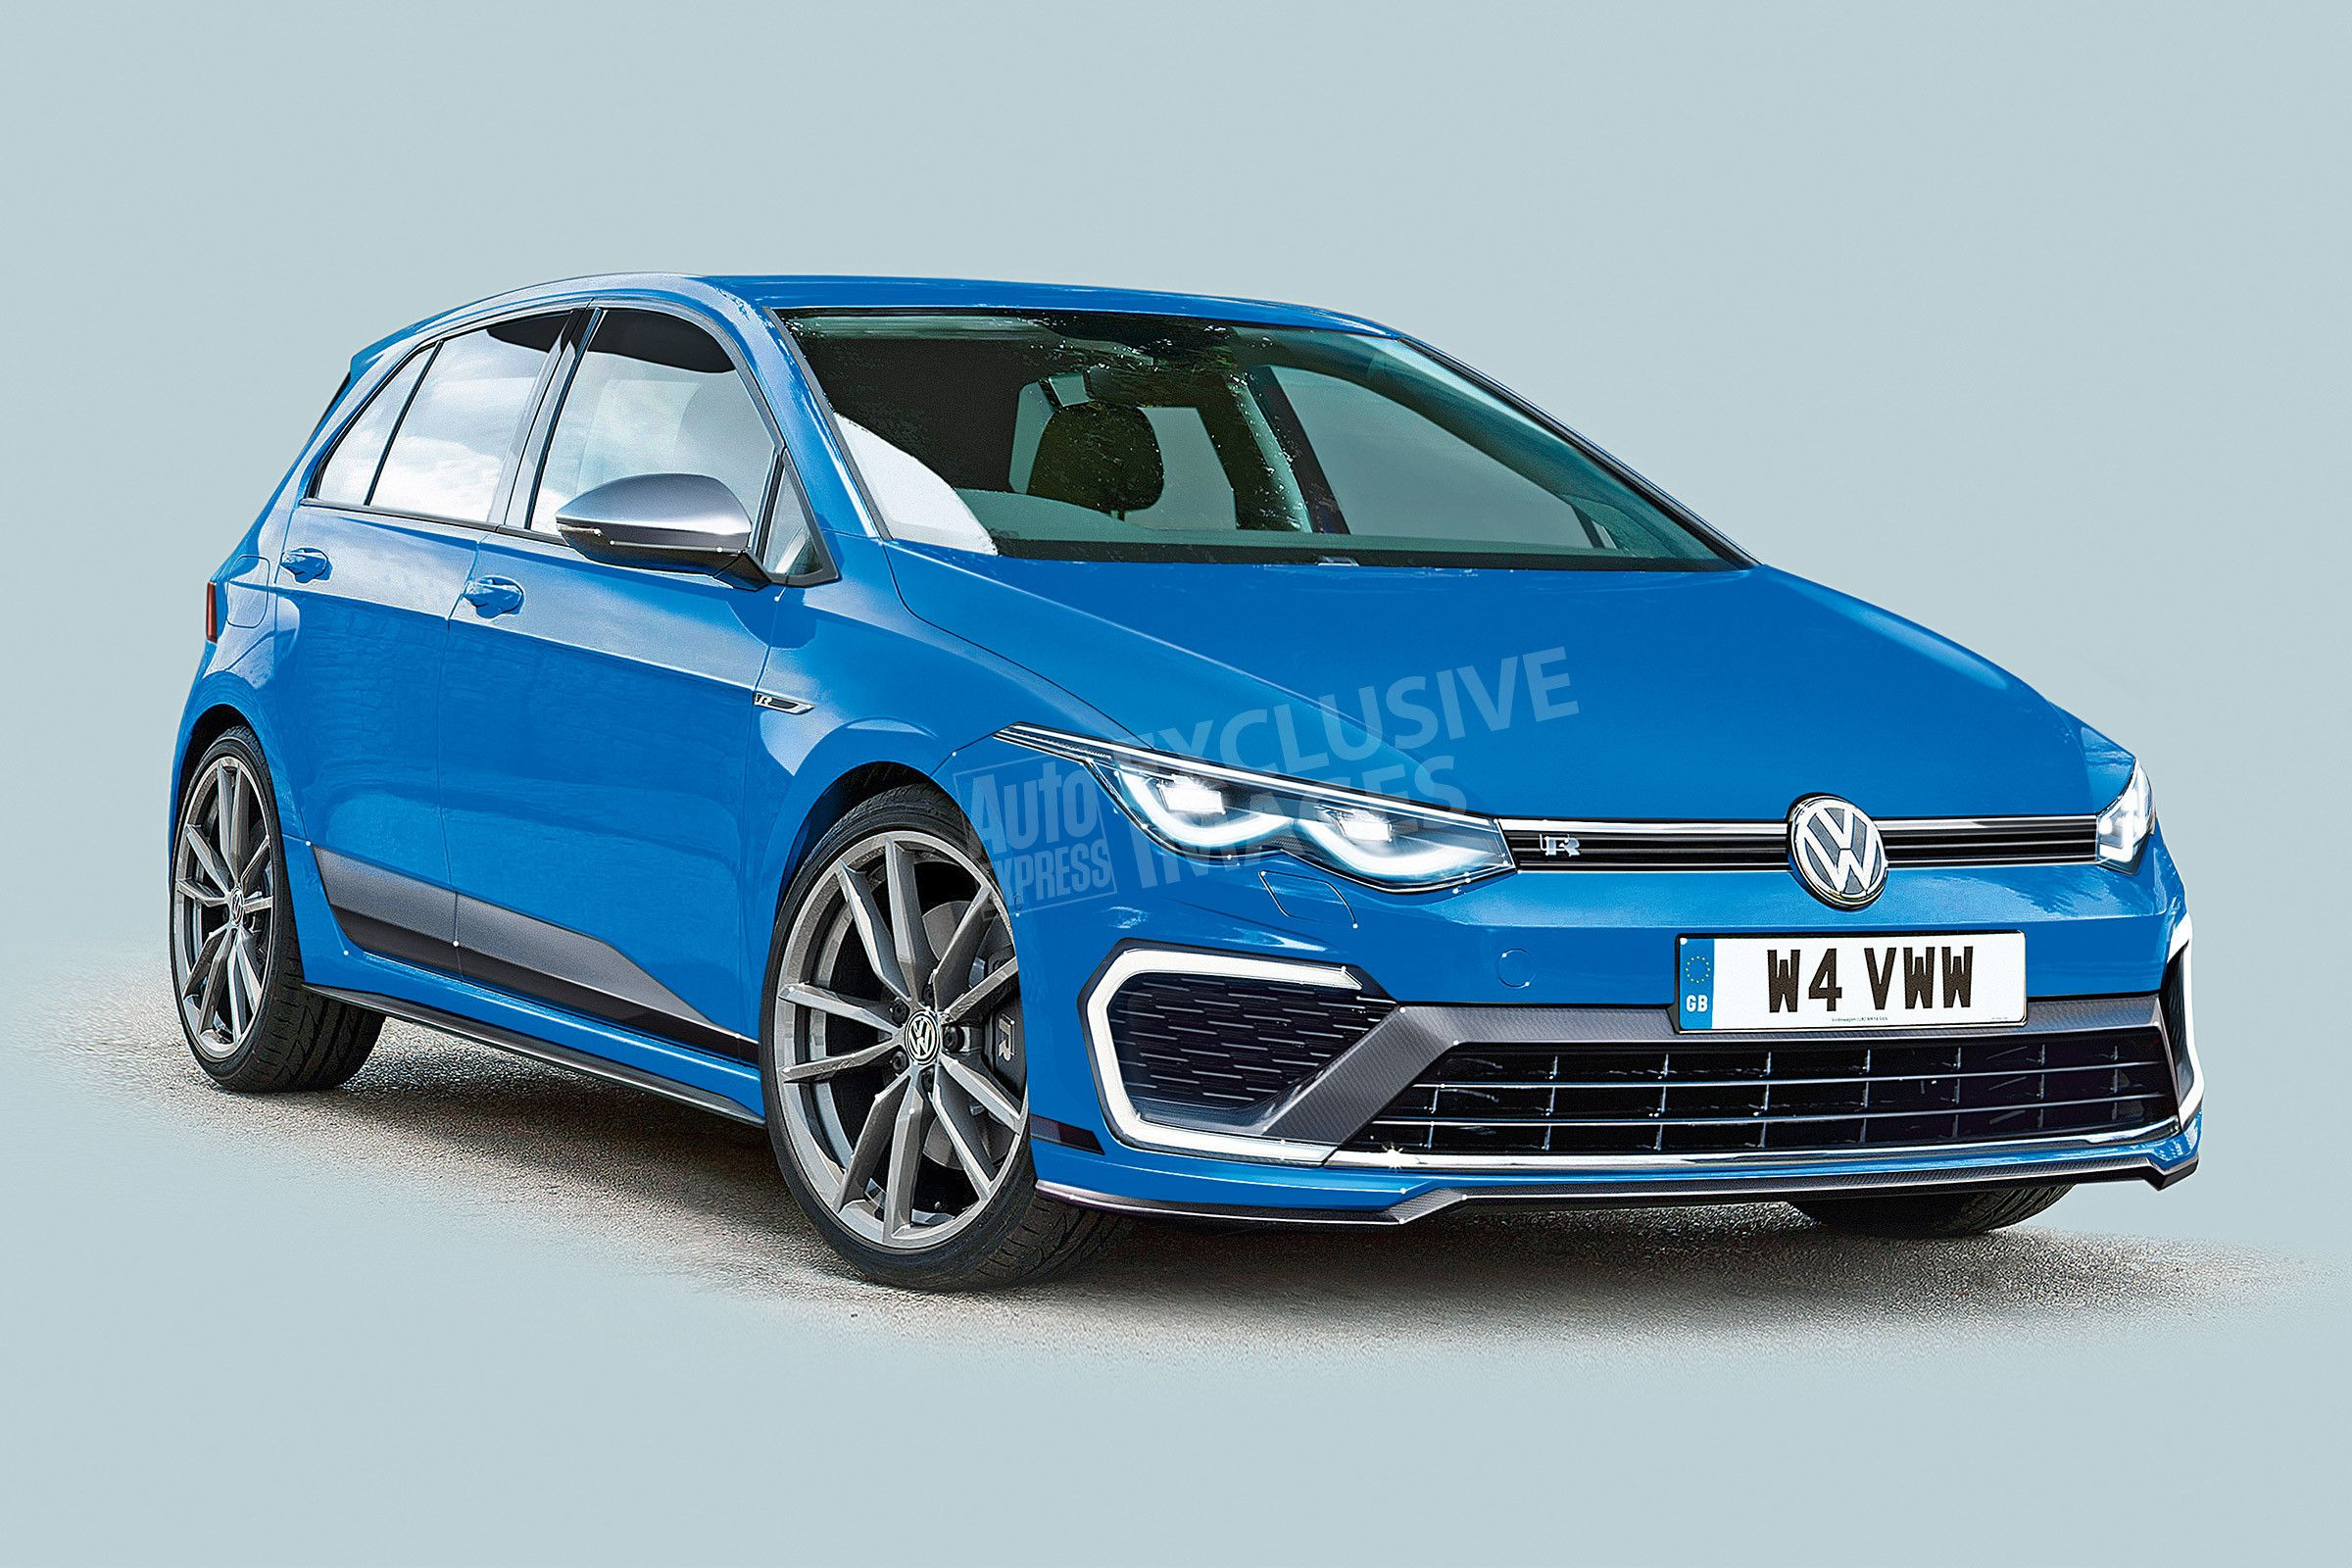 2020 Volkswagen Golf R New Volkswagen Golf Gtd Facelift 2017 Review Volkswagen Golf R Volkswagen Volkswagen Gti